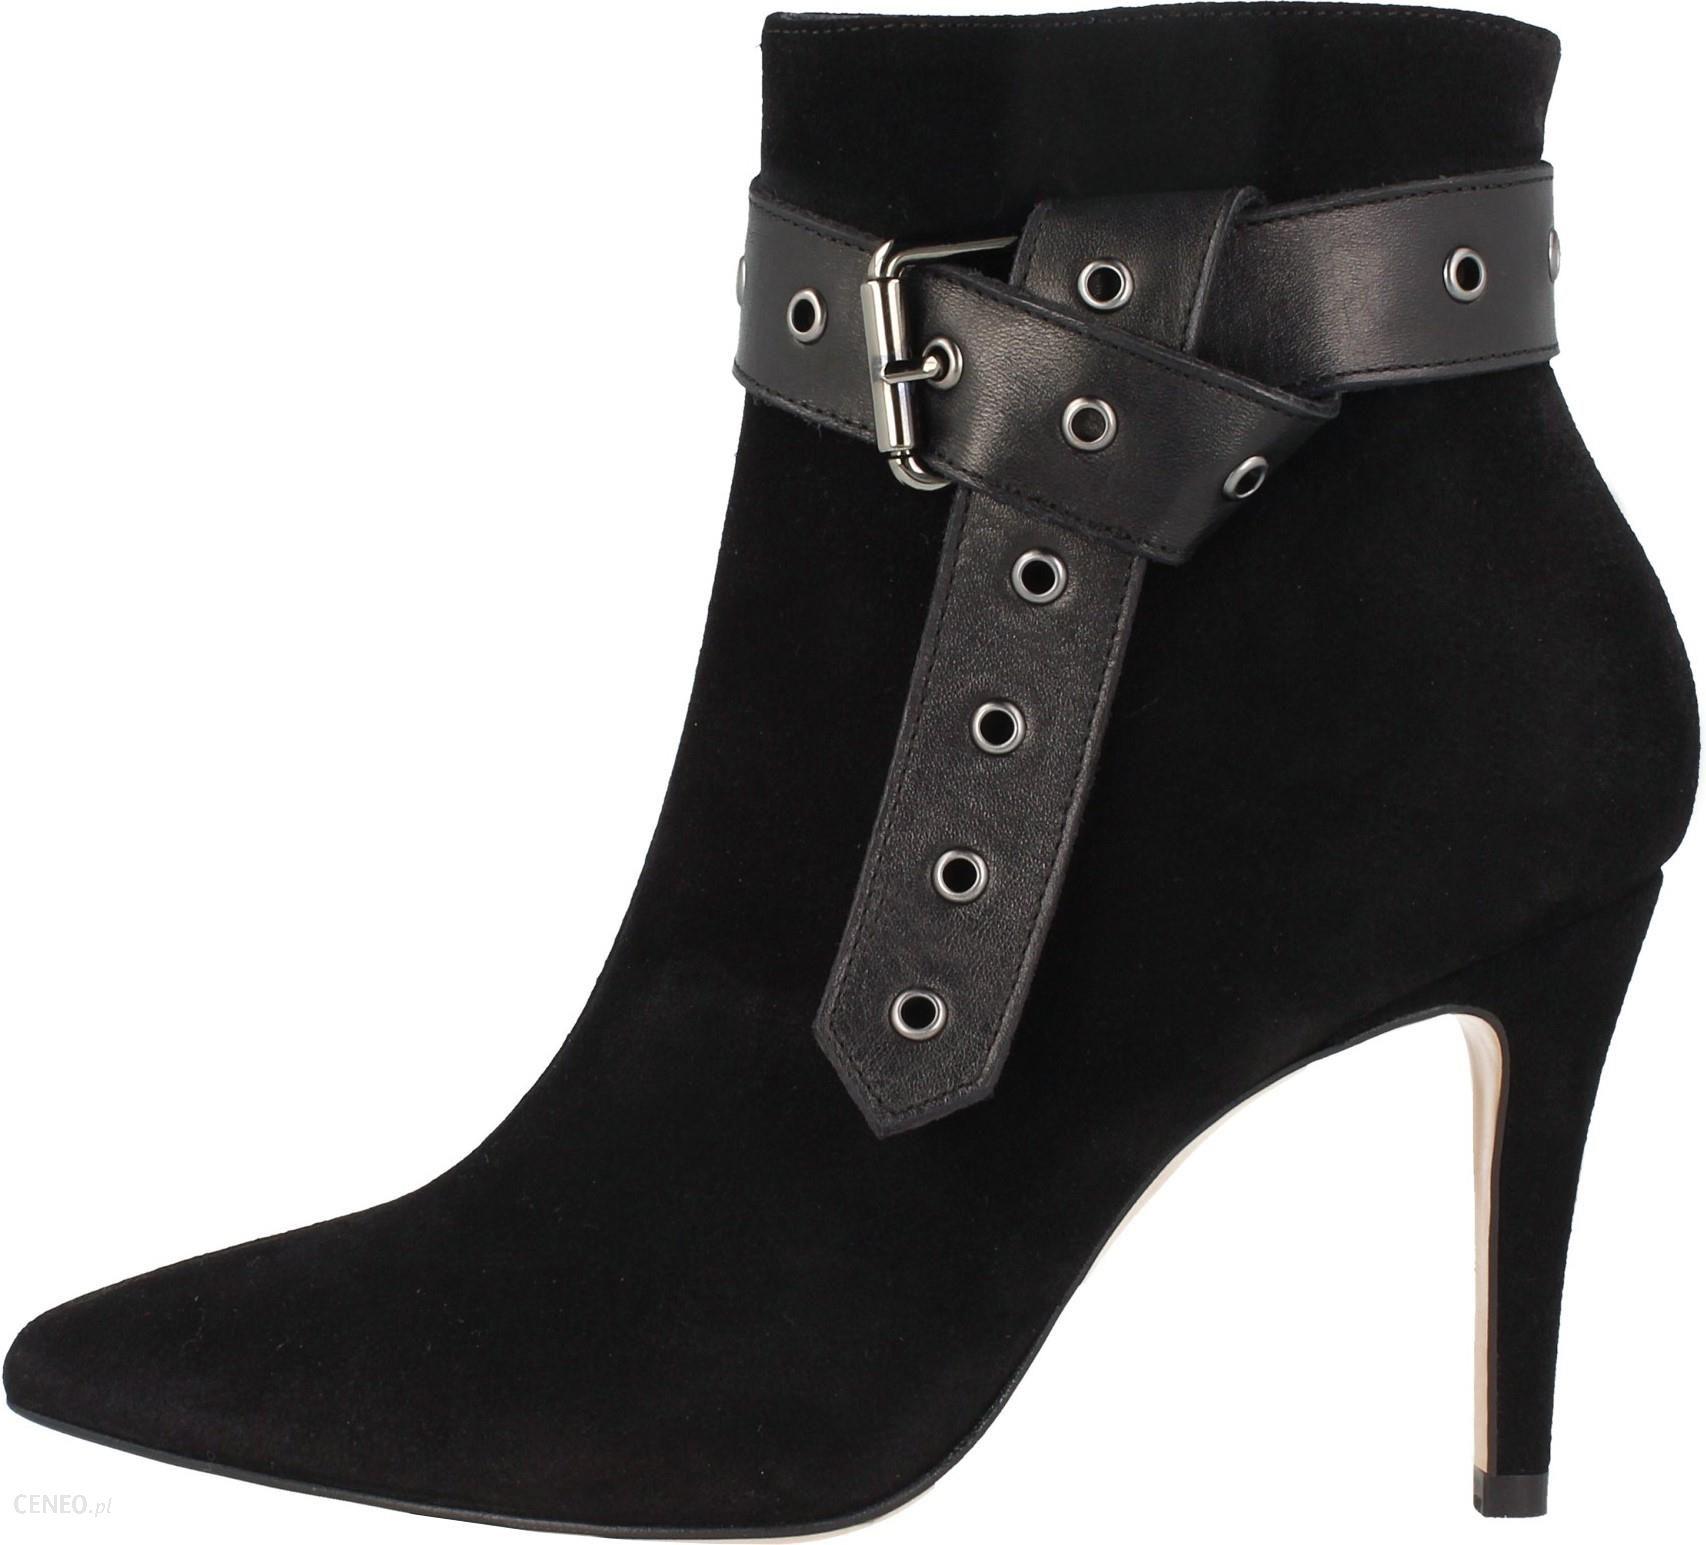 9e71db5985466 Roberto Botella buty za kostkę damskie 41, czarny - Ceny i opinie ...